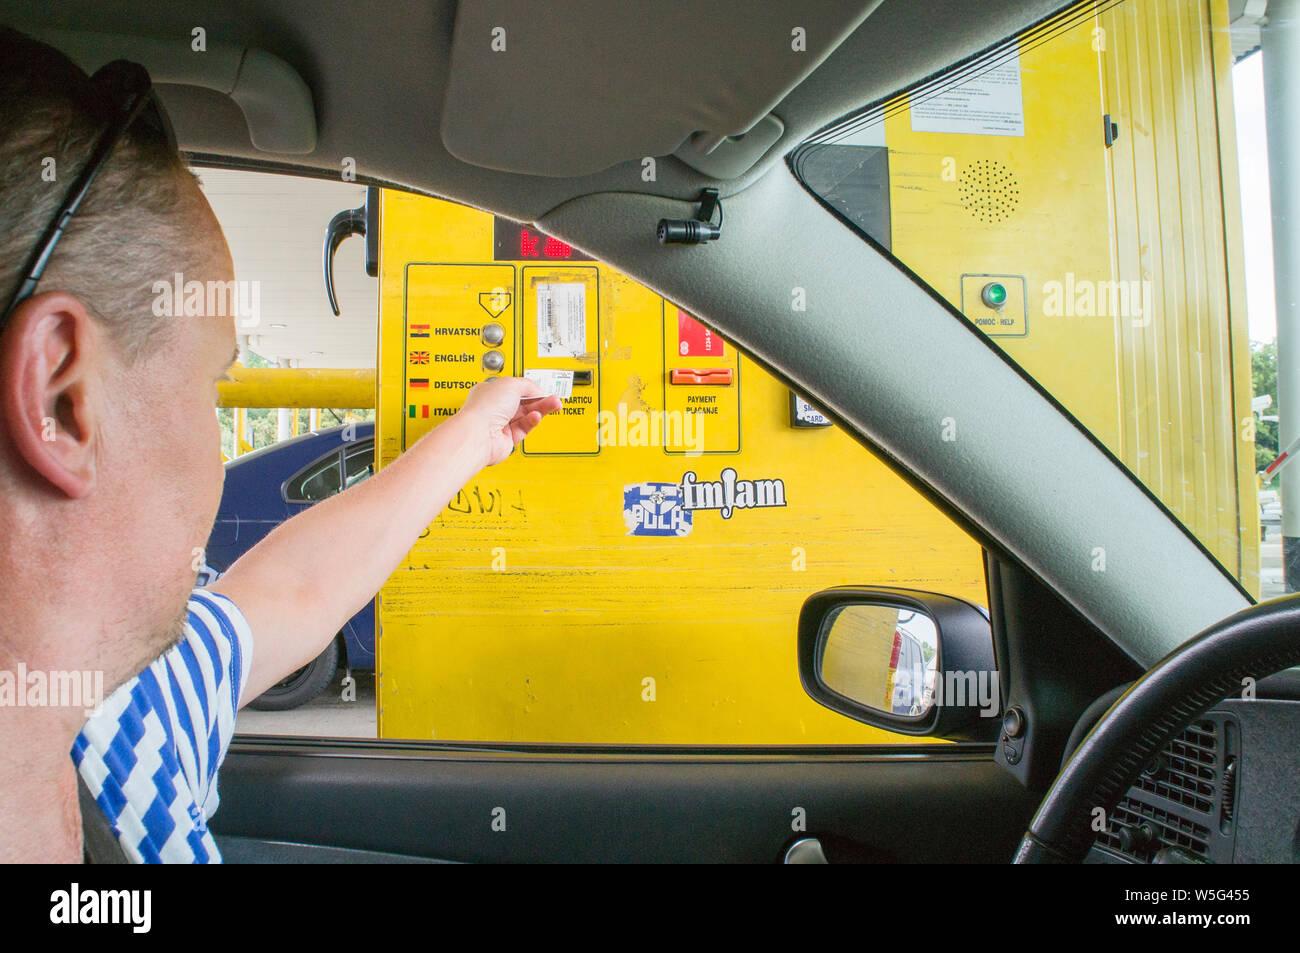 A1 motorway, highway, Zagreb/Demerje, sign Cestarina, BANK CARD NO